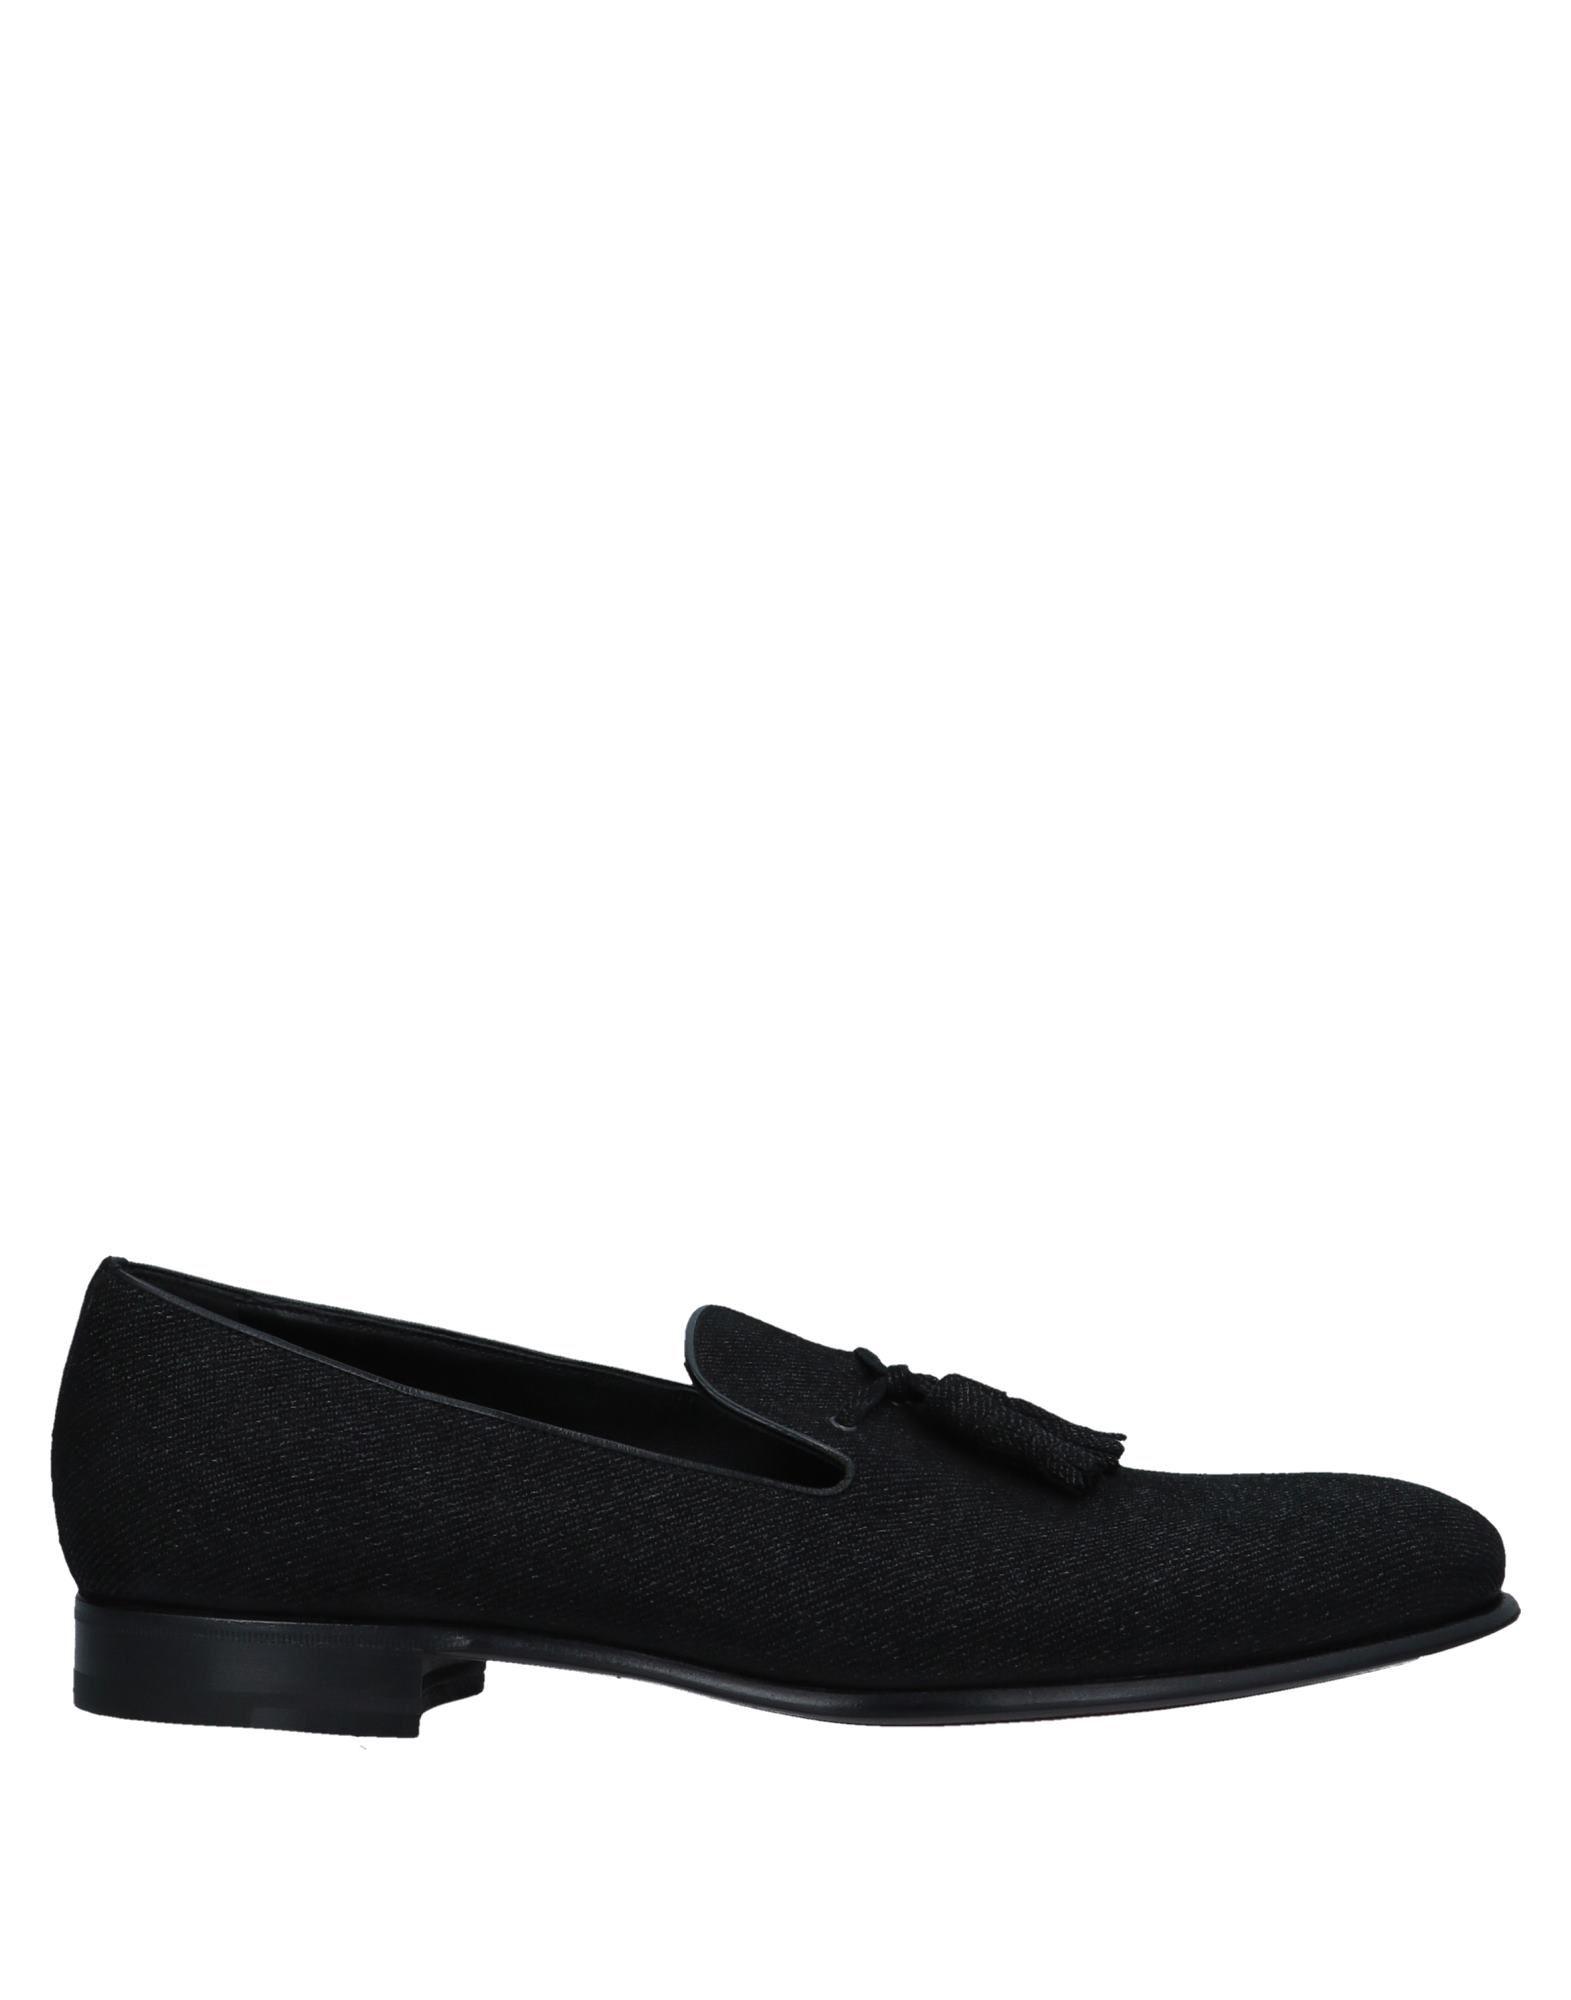 A.Testoni Mokassins Herren  11543893LV Gute Qualität beliebte Schuhe